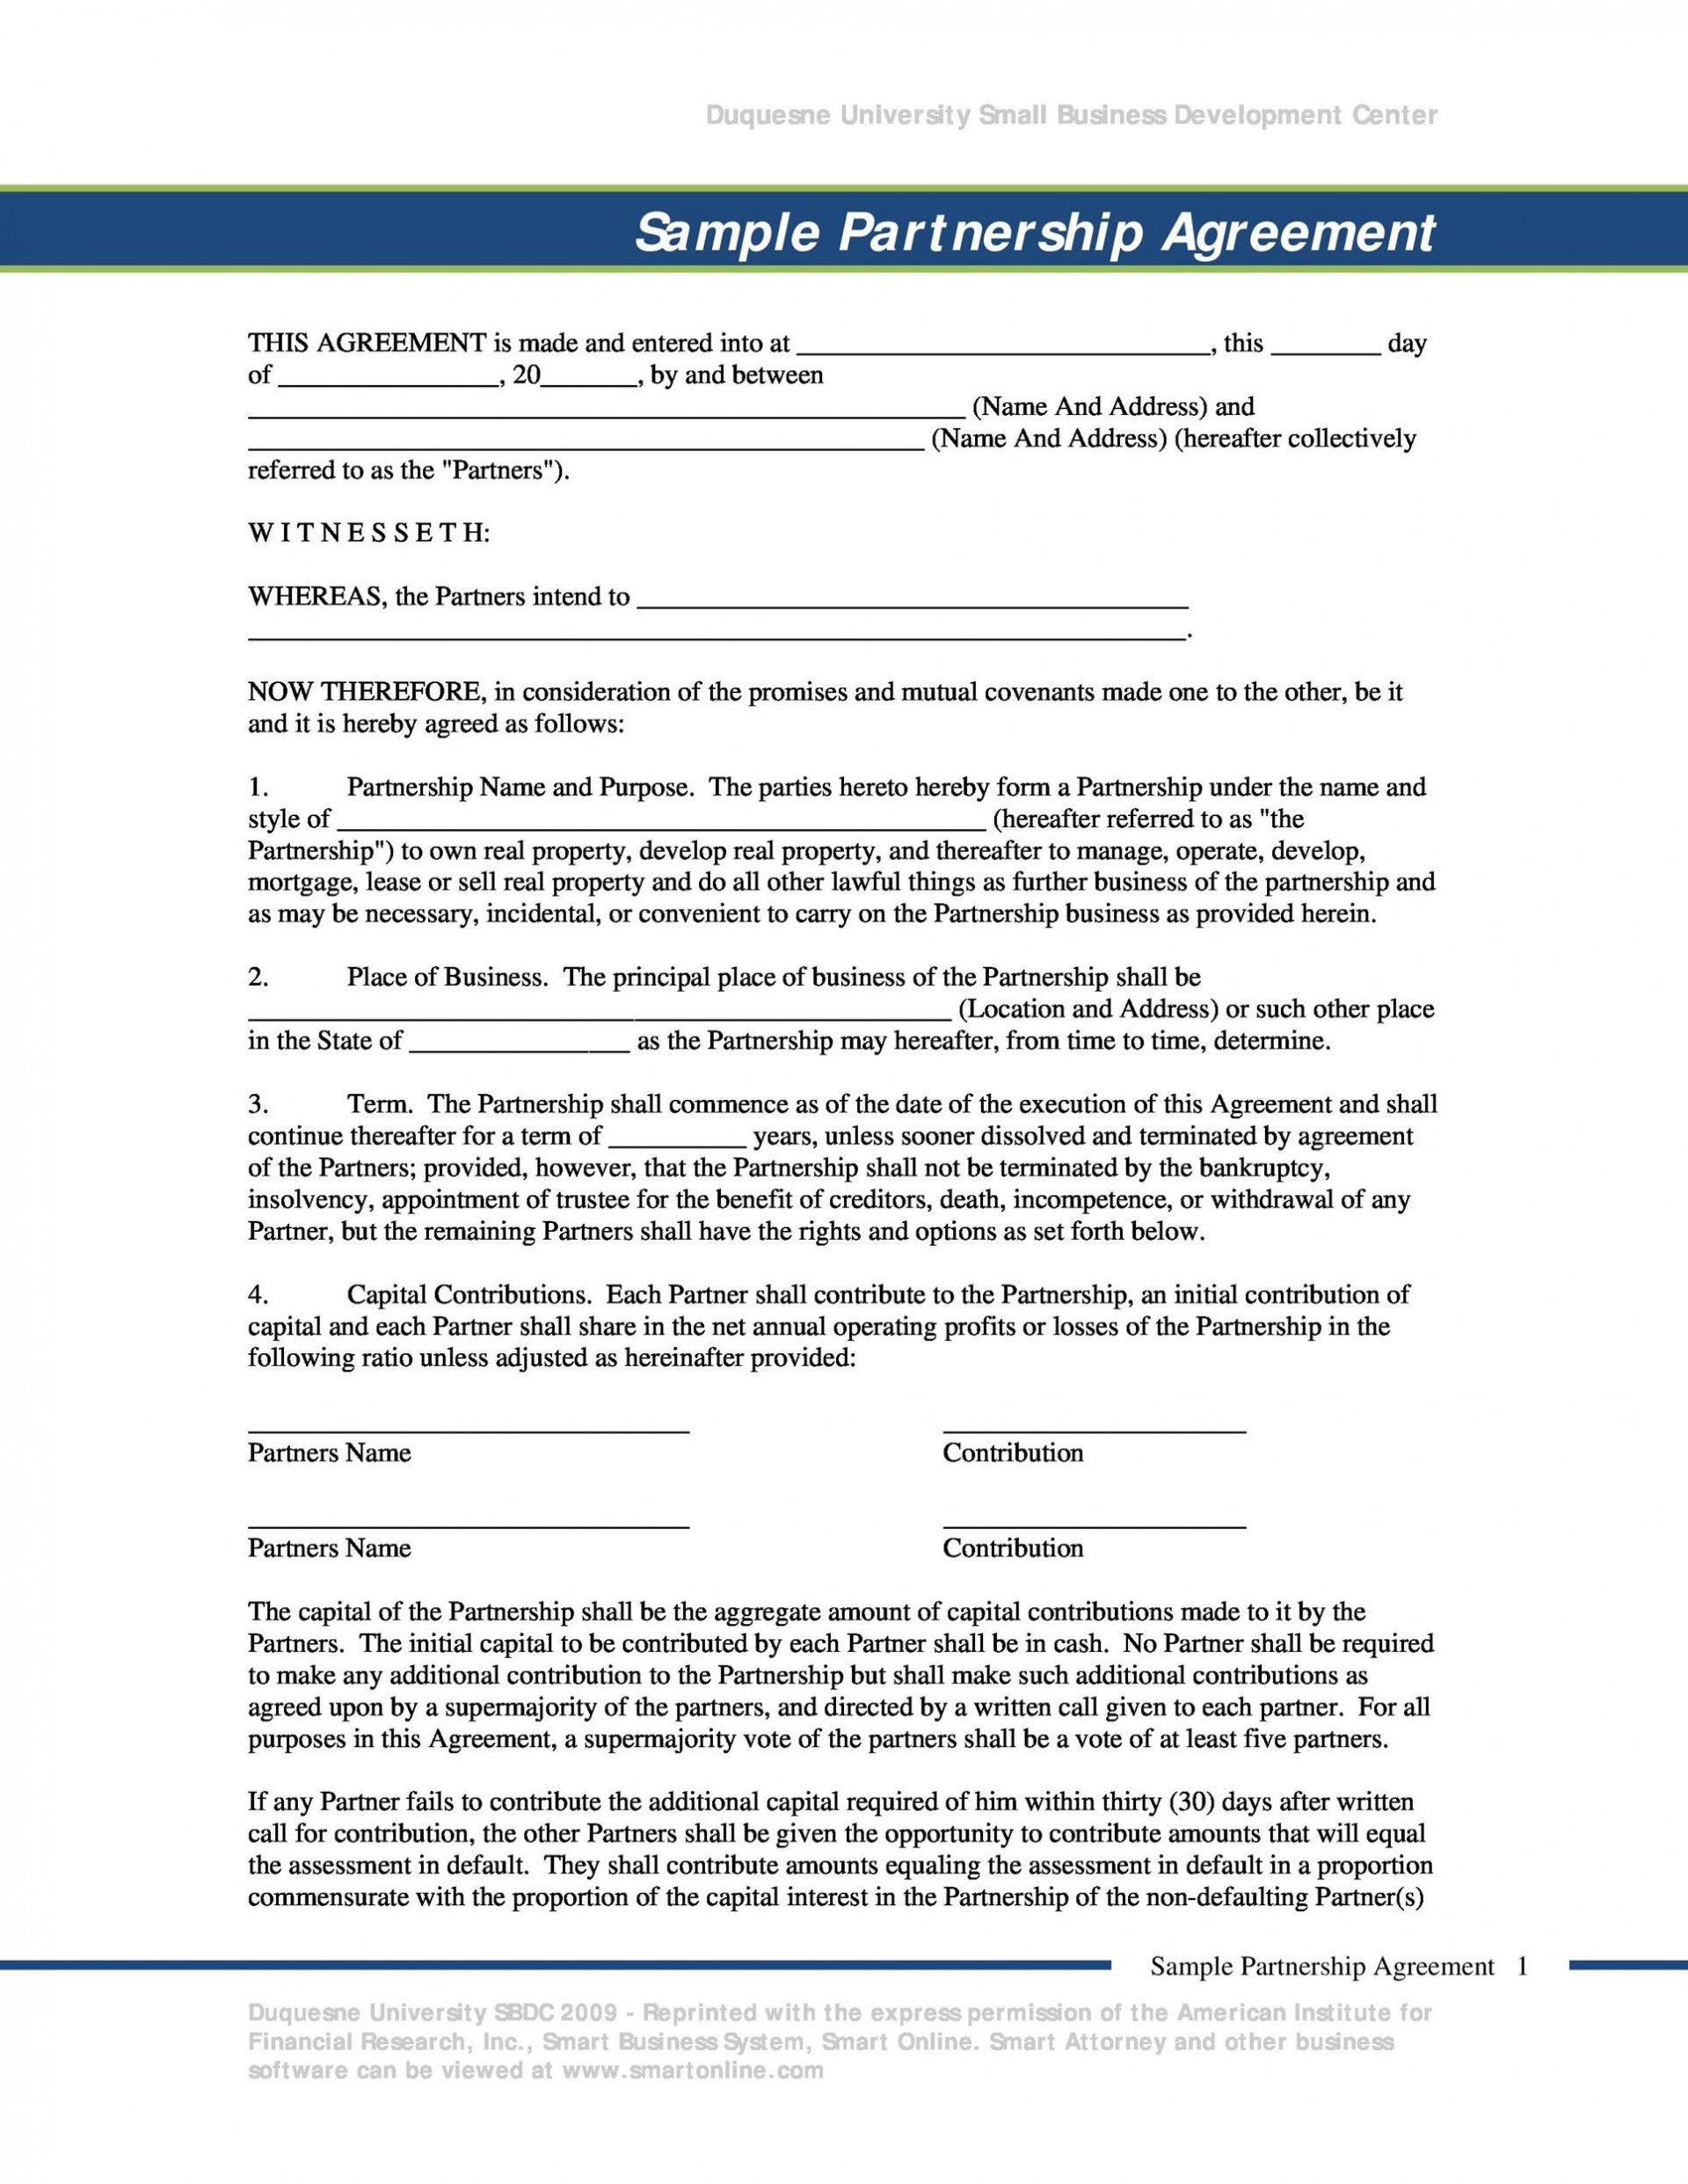 008 Wondrou Real Estate Partnership Agreement Template Idea  Team Investment1920